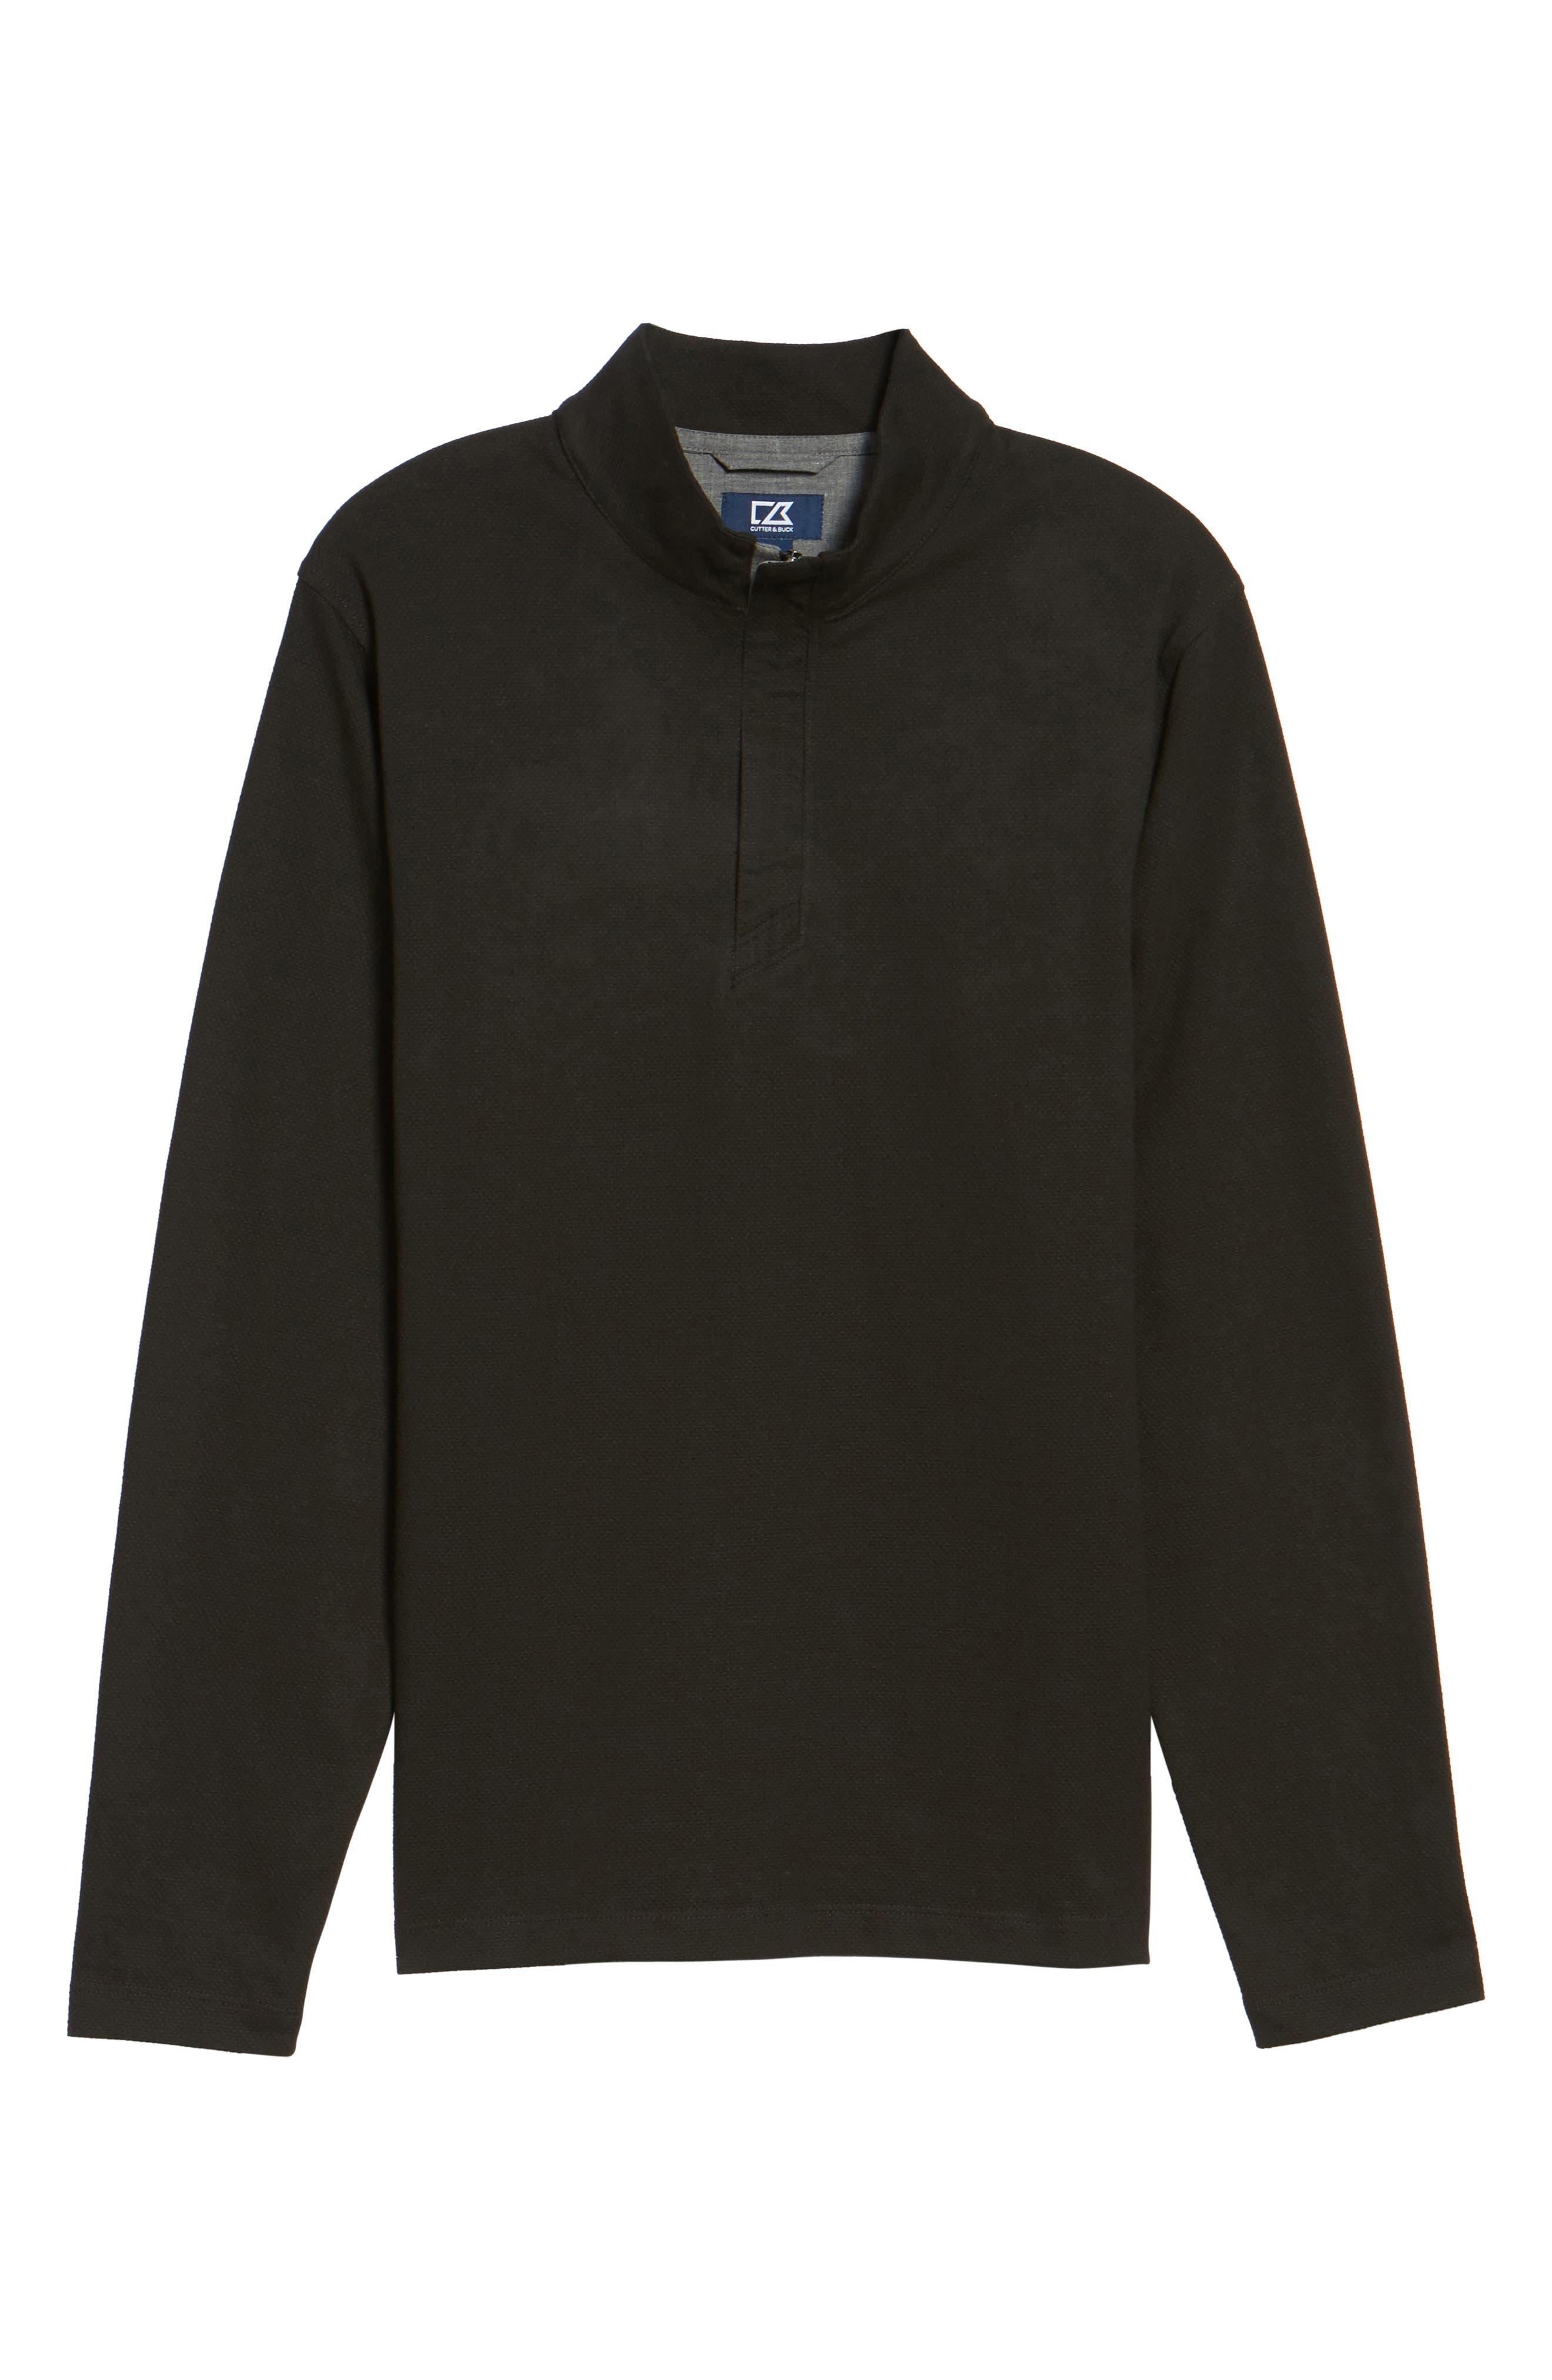 Hewitt Quarter Zip Pullover,                             Alternate thumbnail 6, color,                             Black